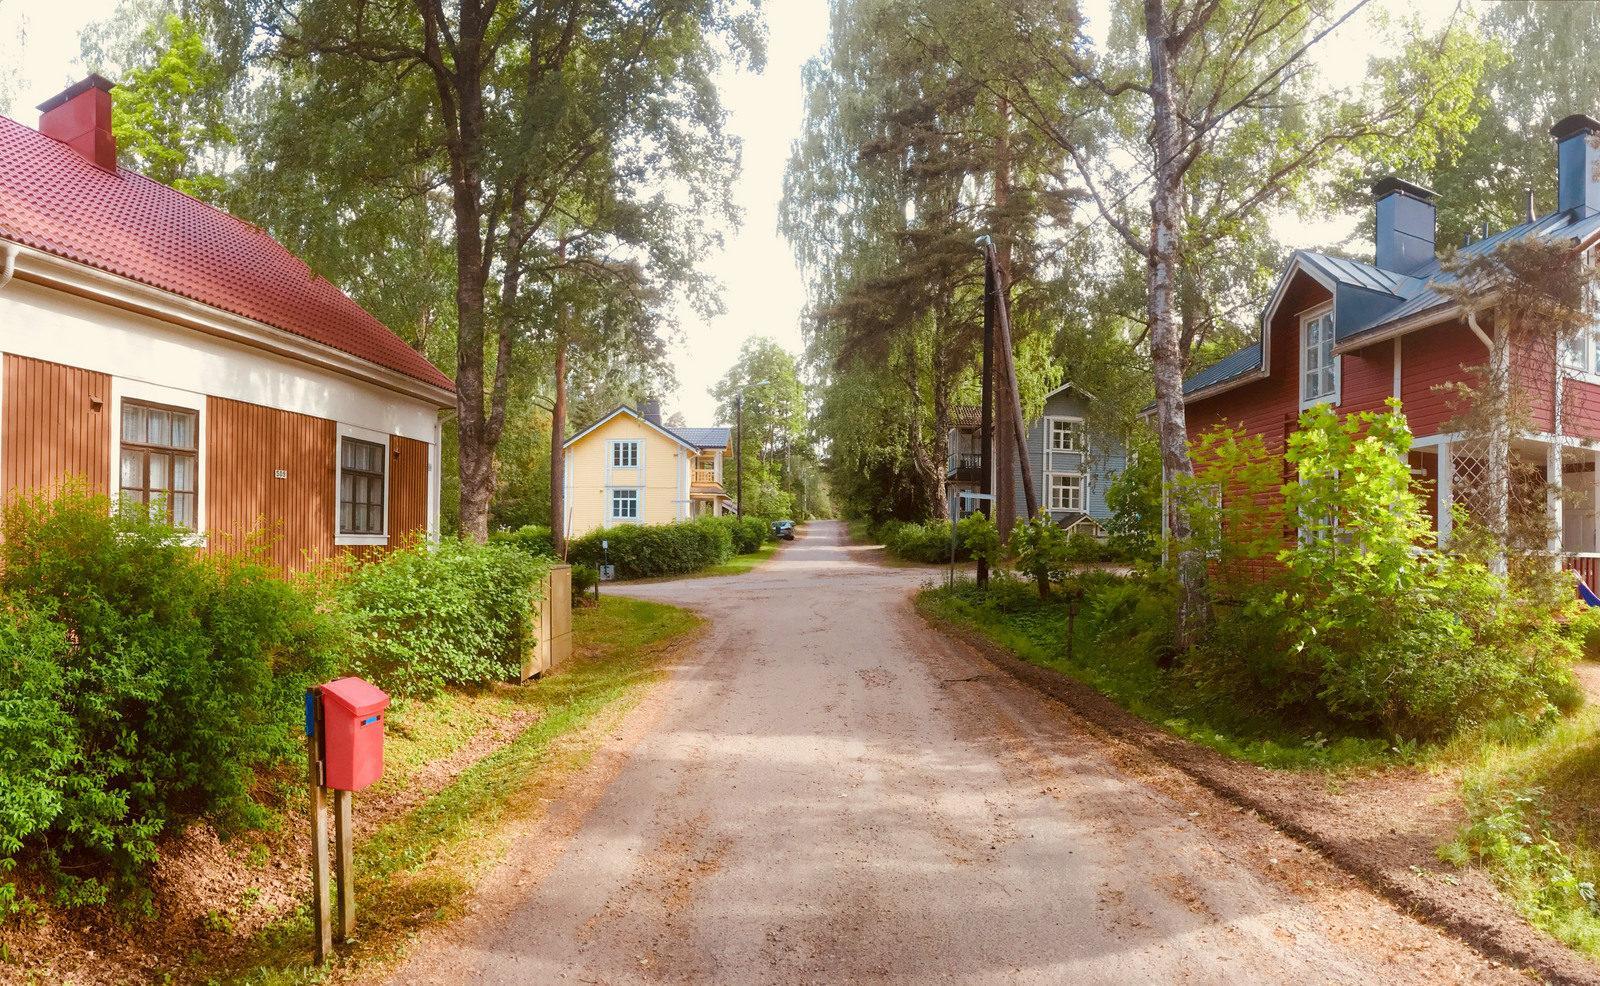 Niskalampi residential area, Imatra